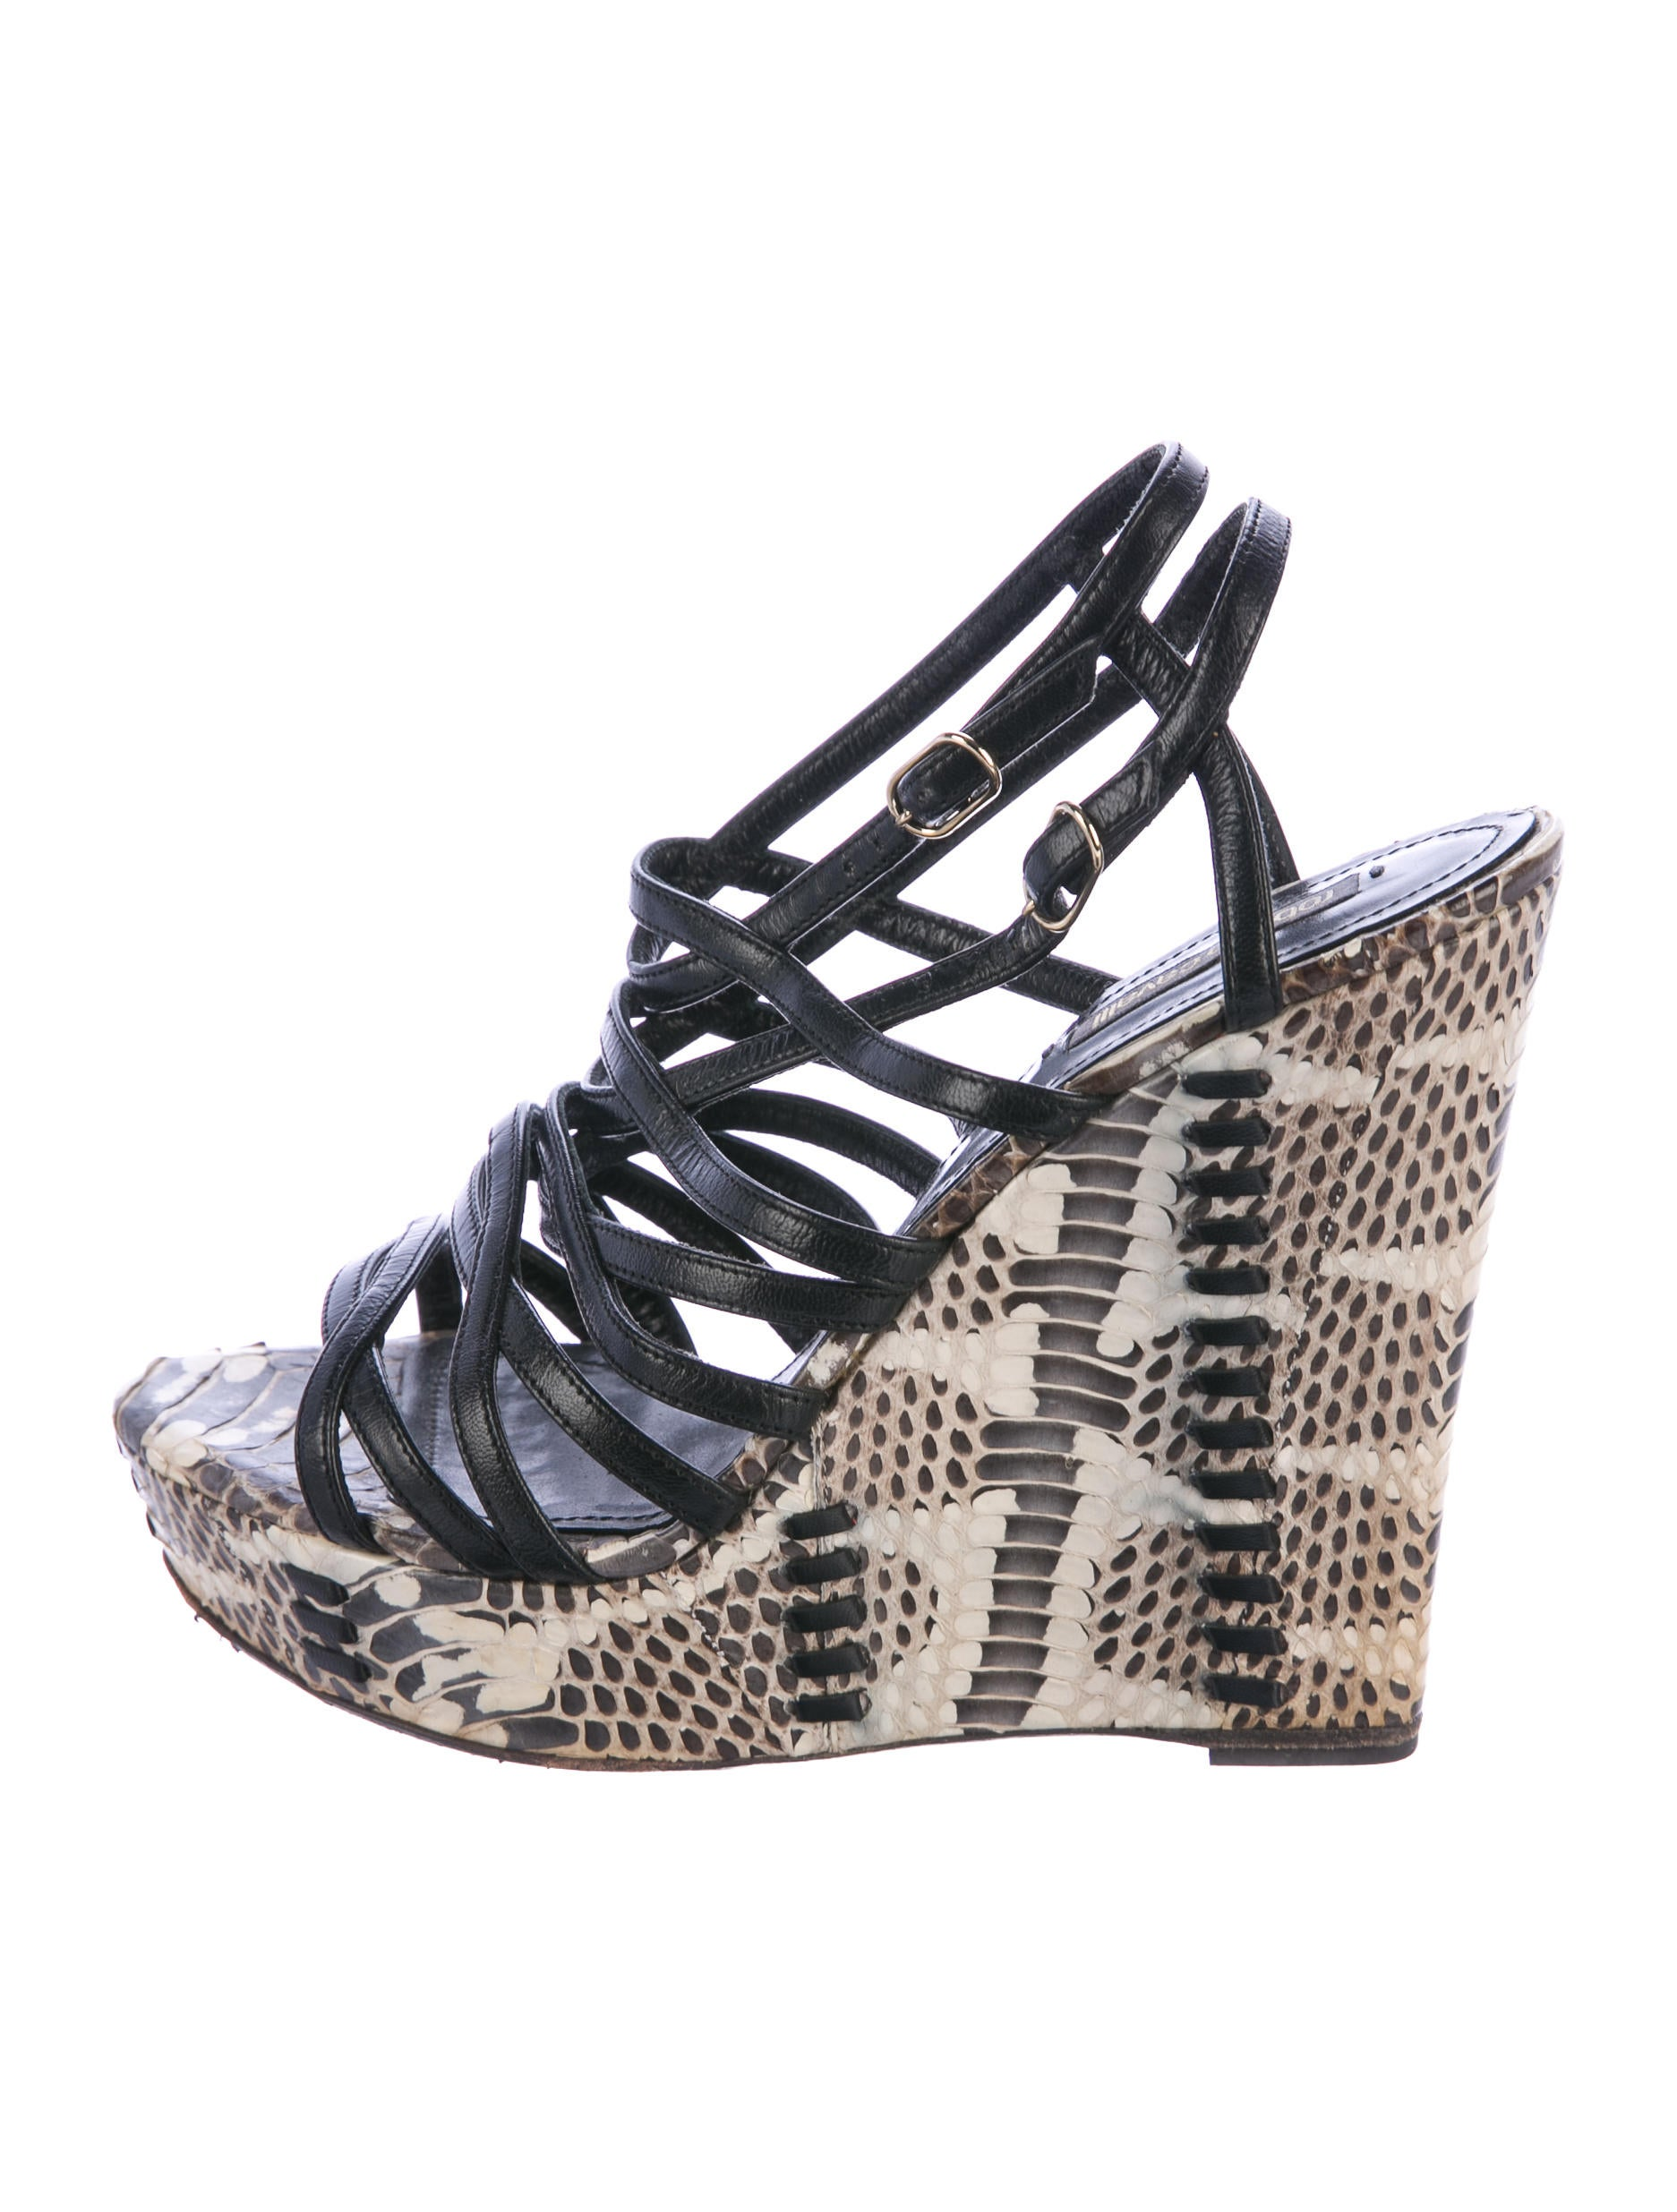 Roberto Cavalli Snakeskin Wedge Sandals cheap manchester great sale tpqZVYPV